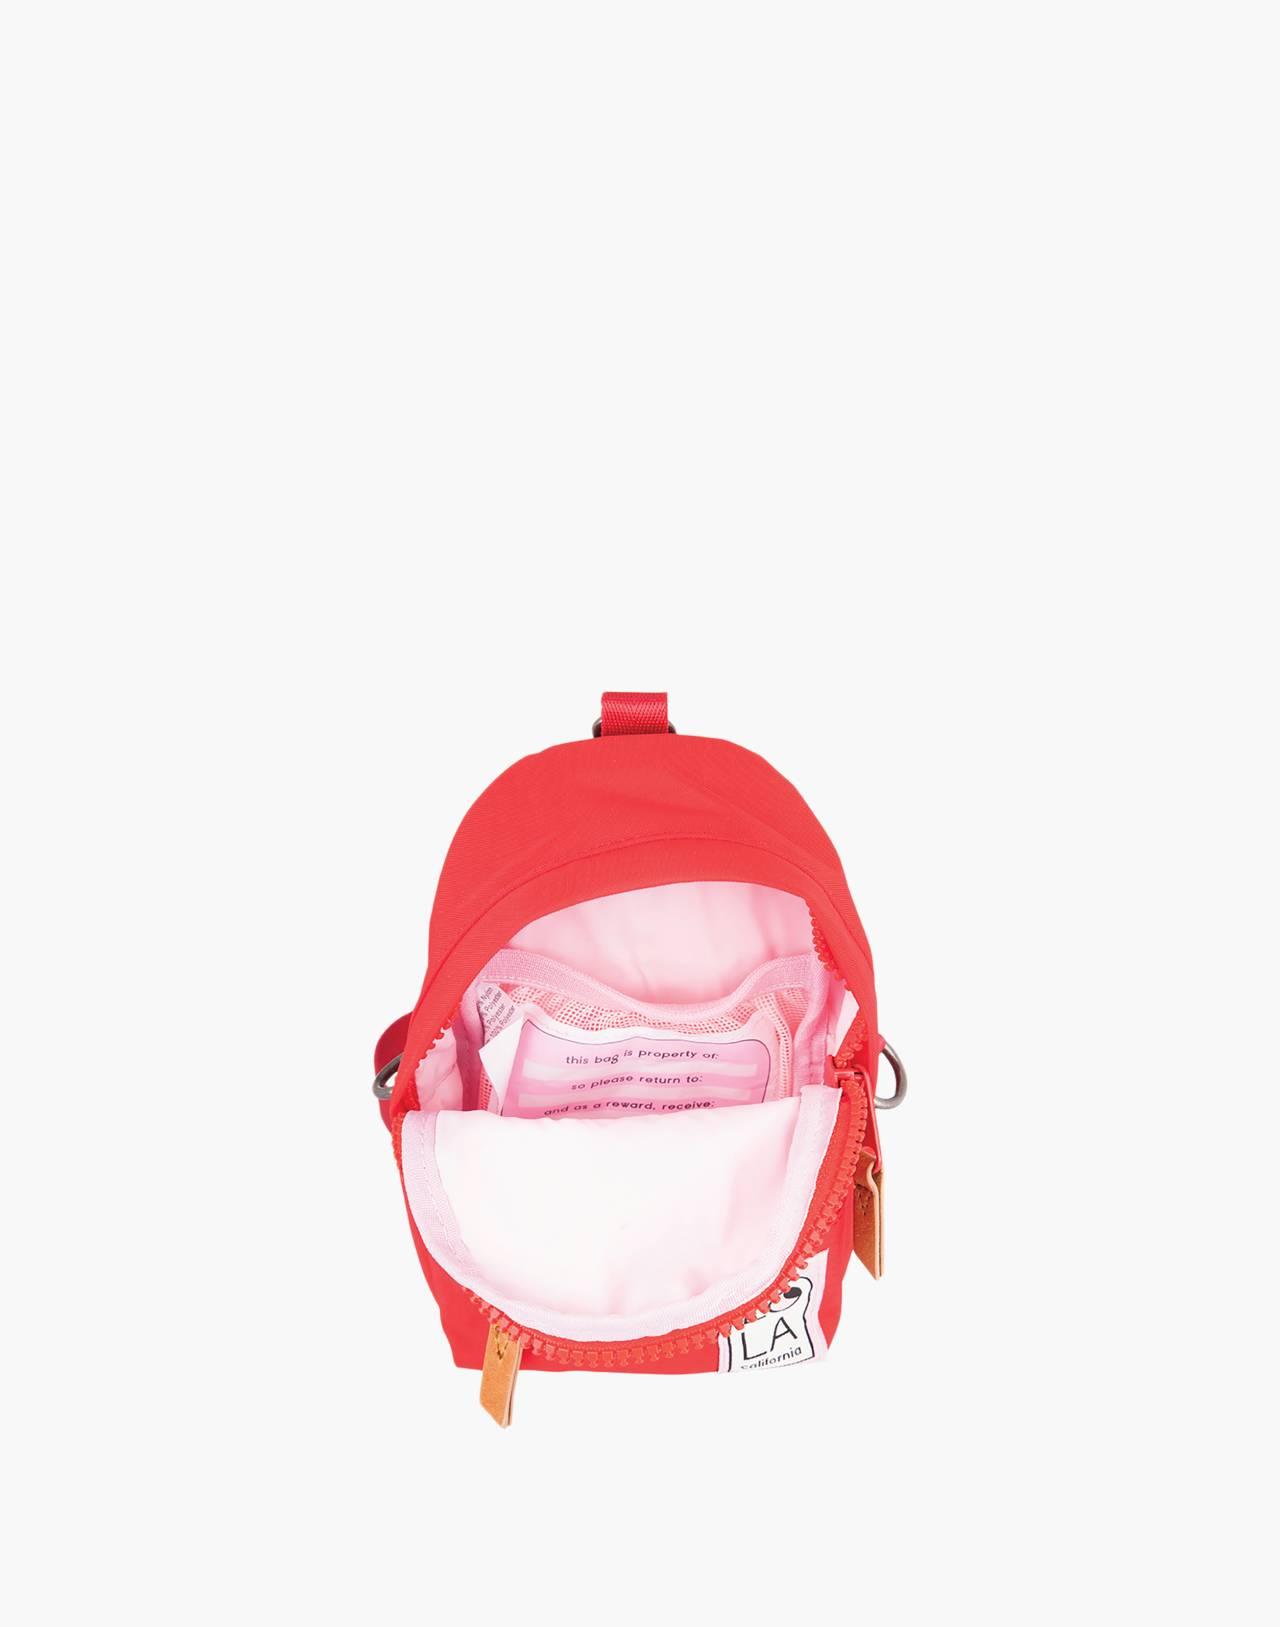 LOLA™ Mondo Stargazer Mini Convertible Backpack in red image 2